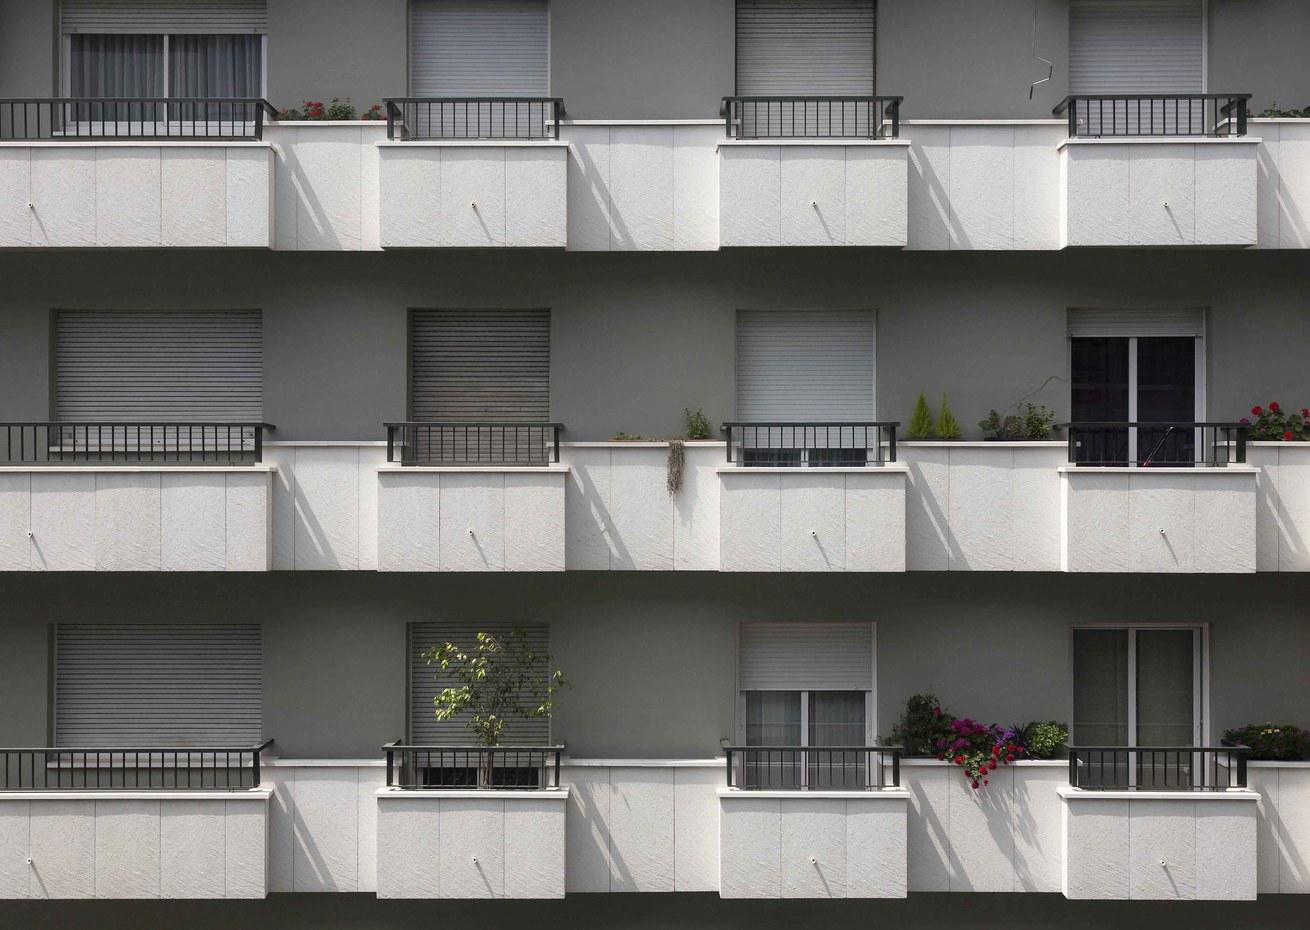 Rehabilitación de frente de terraza en acabado PÉTREO